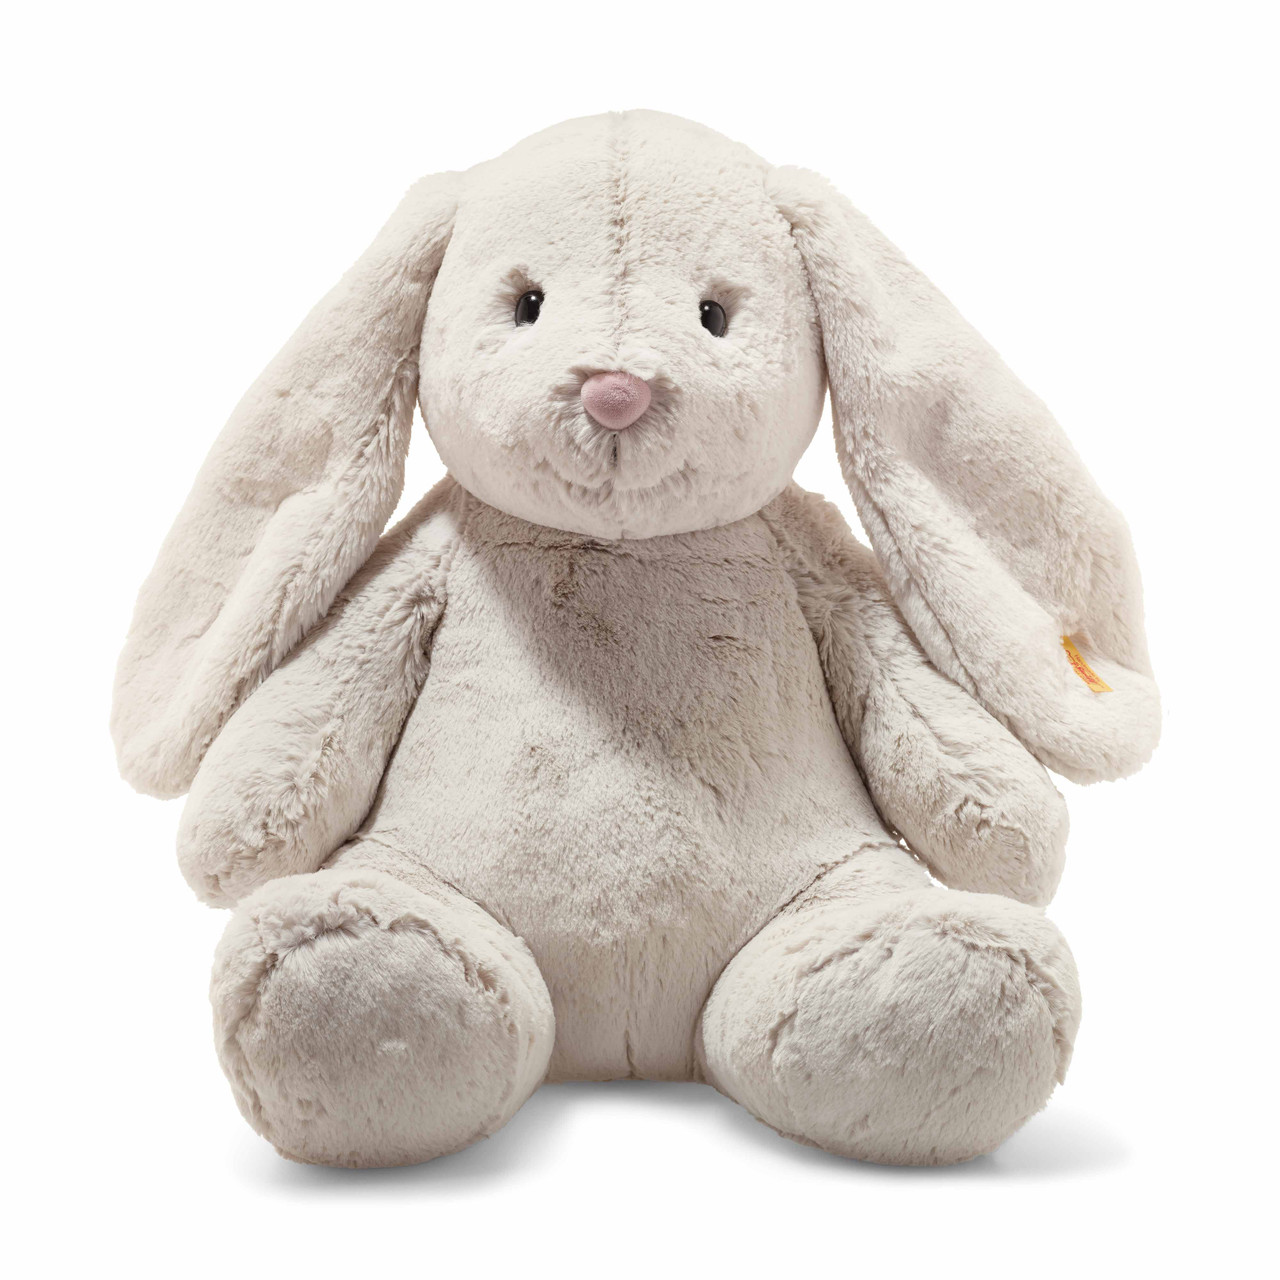 Steiff Hoppel Rabbit Grip Toy Baby Soft Skin Machine Washable MIB 237522